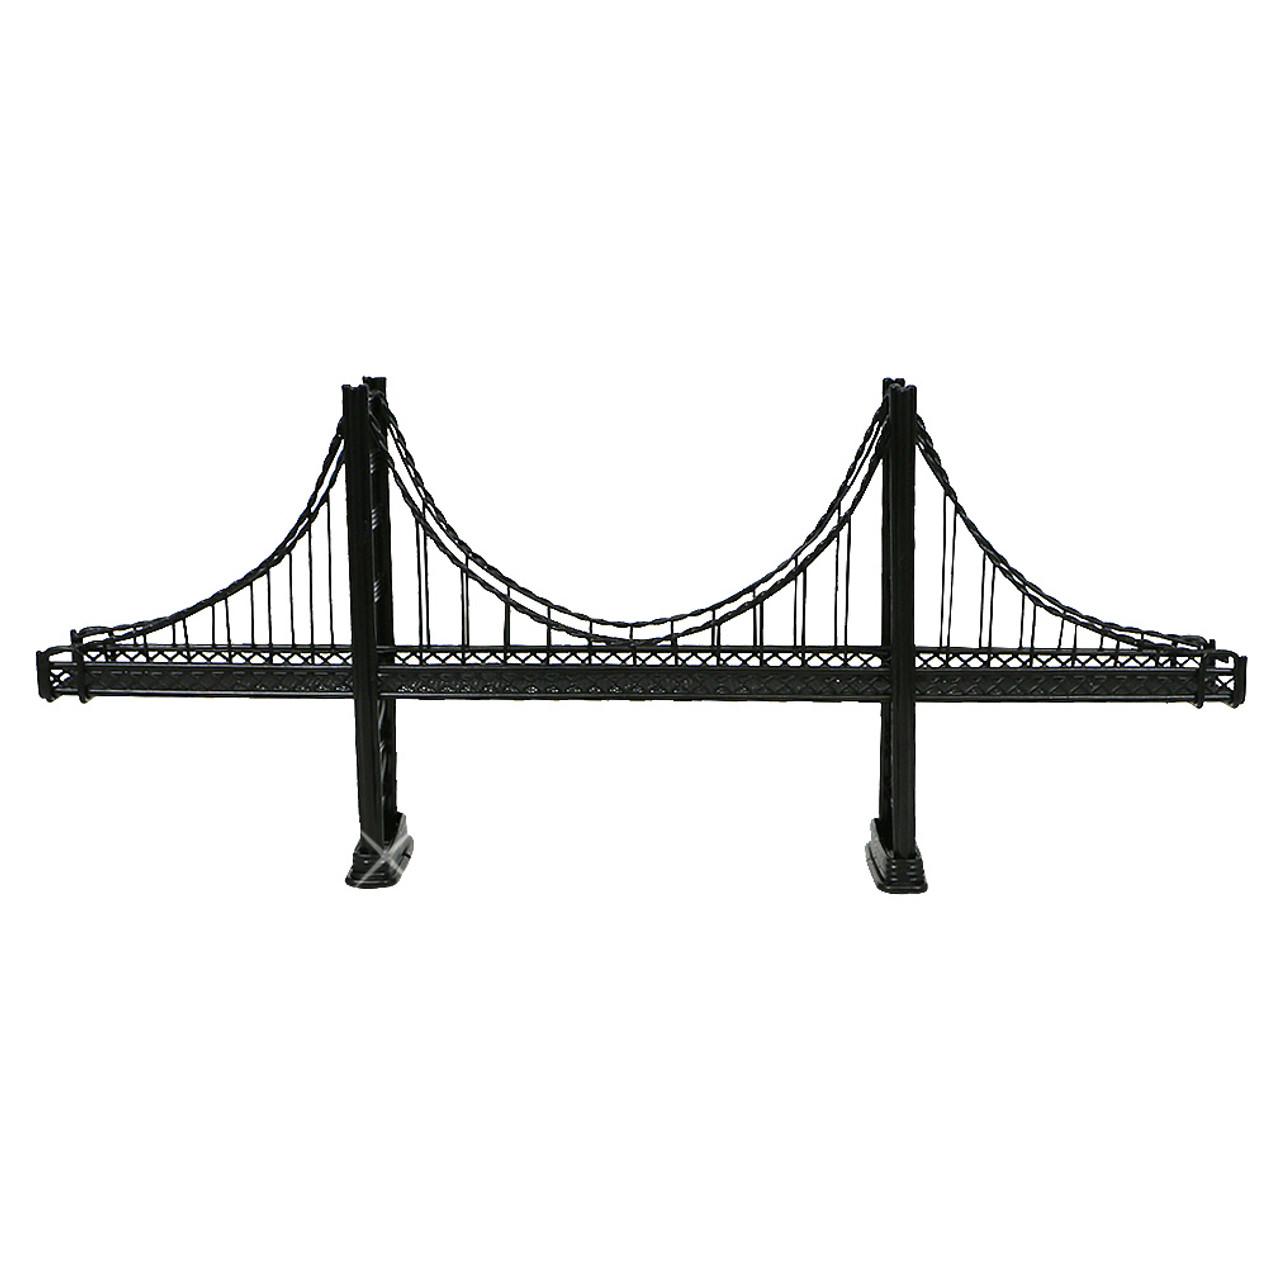 Black Golden Gate Bridge Wire Model